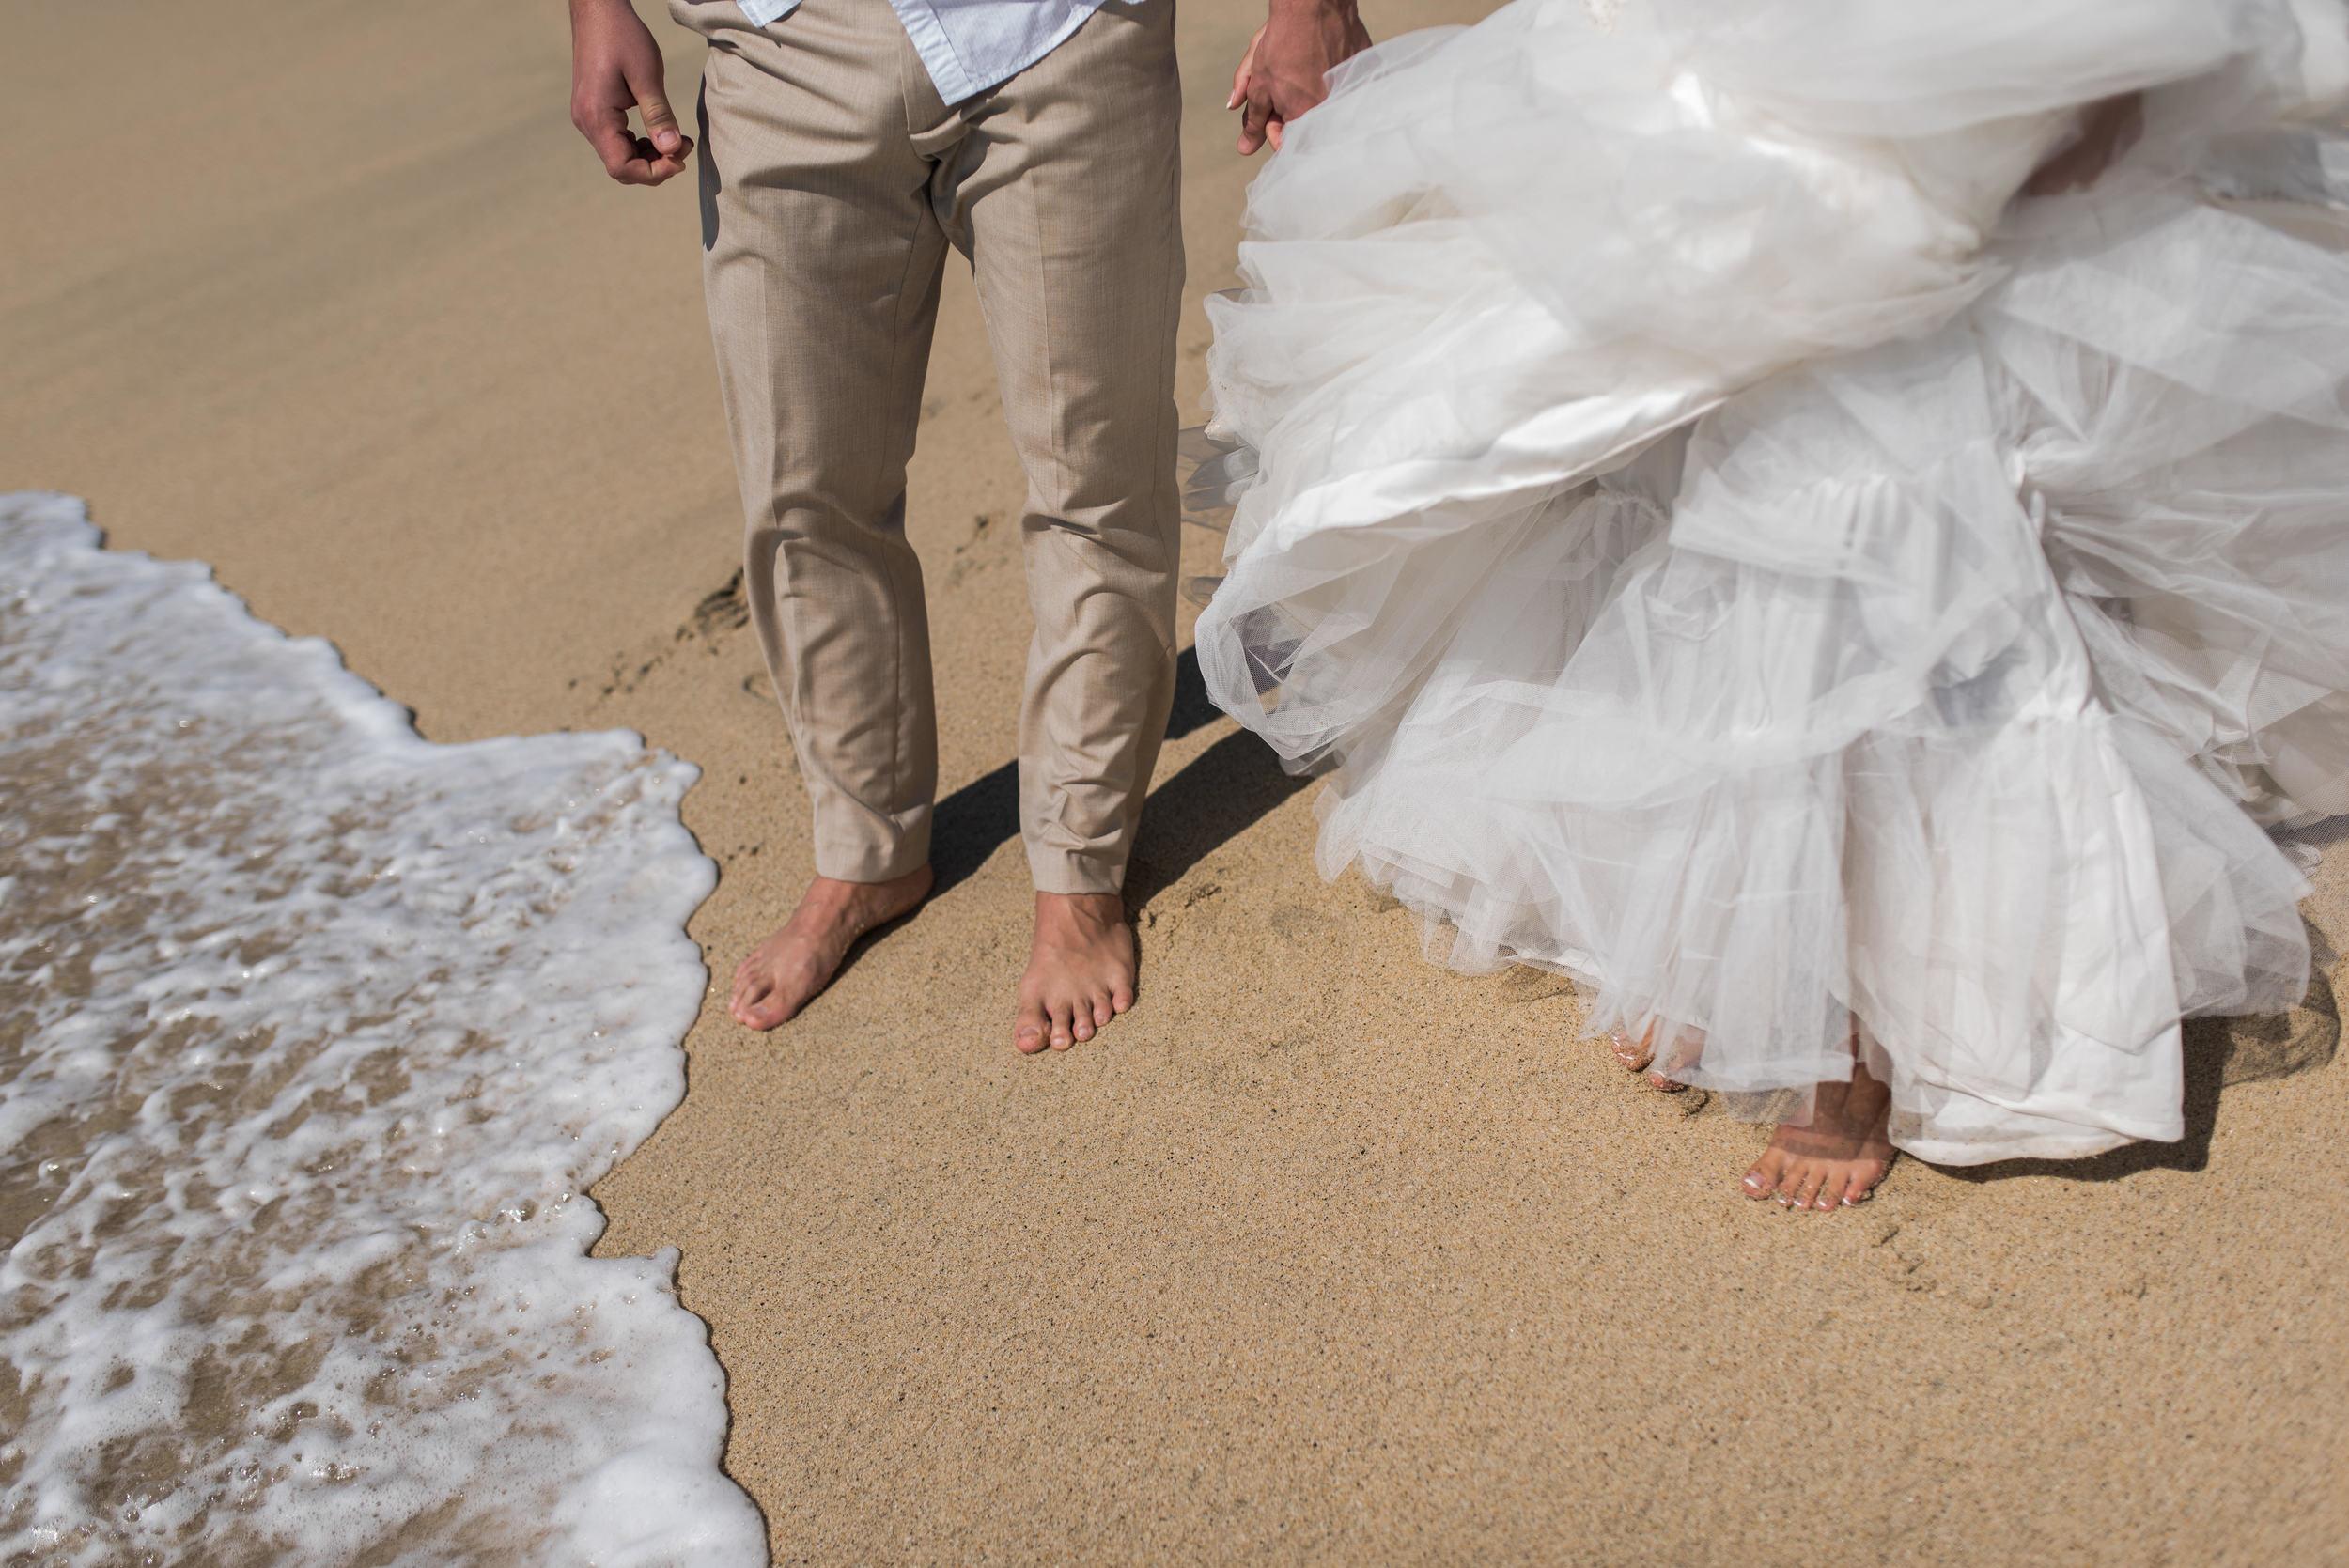 San-Jose-del-Cabo-trash-the-dress